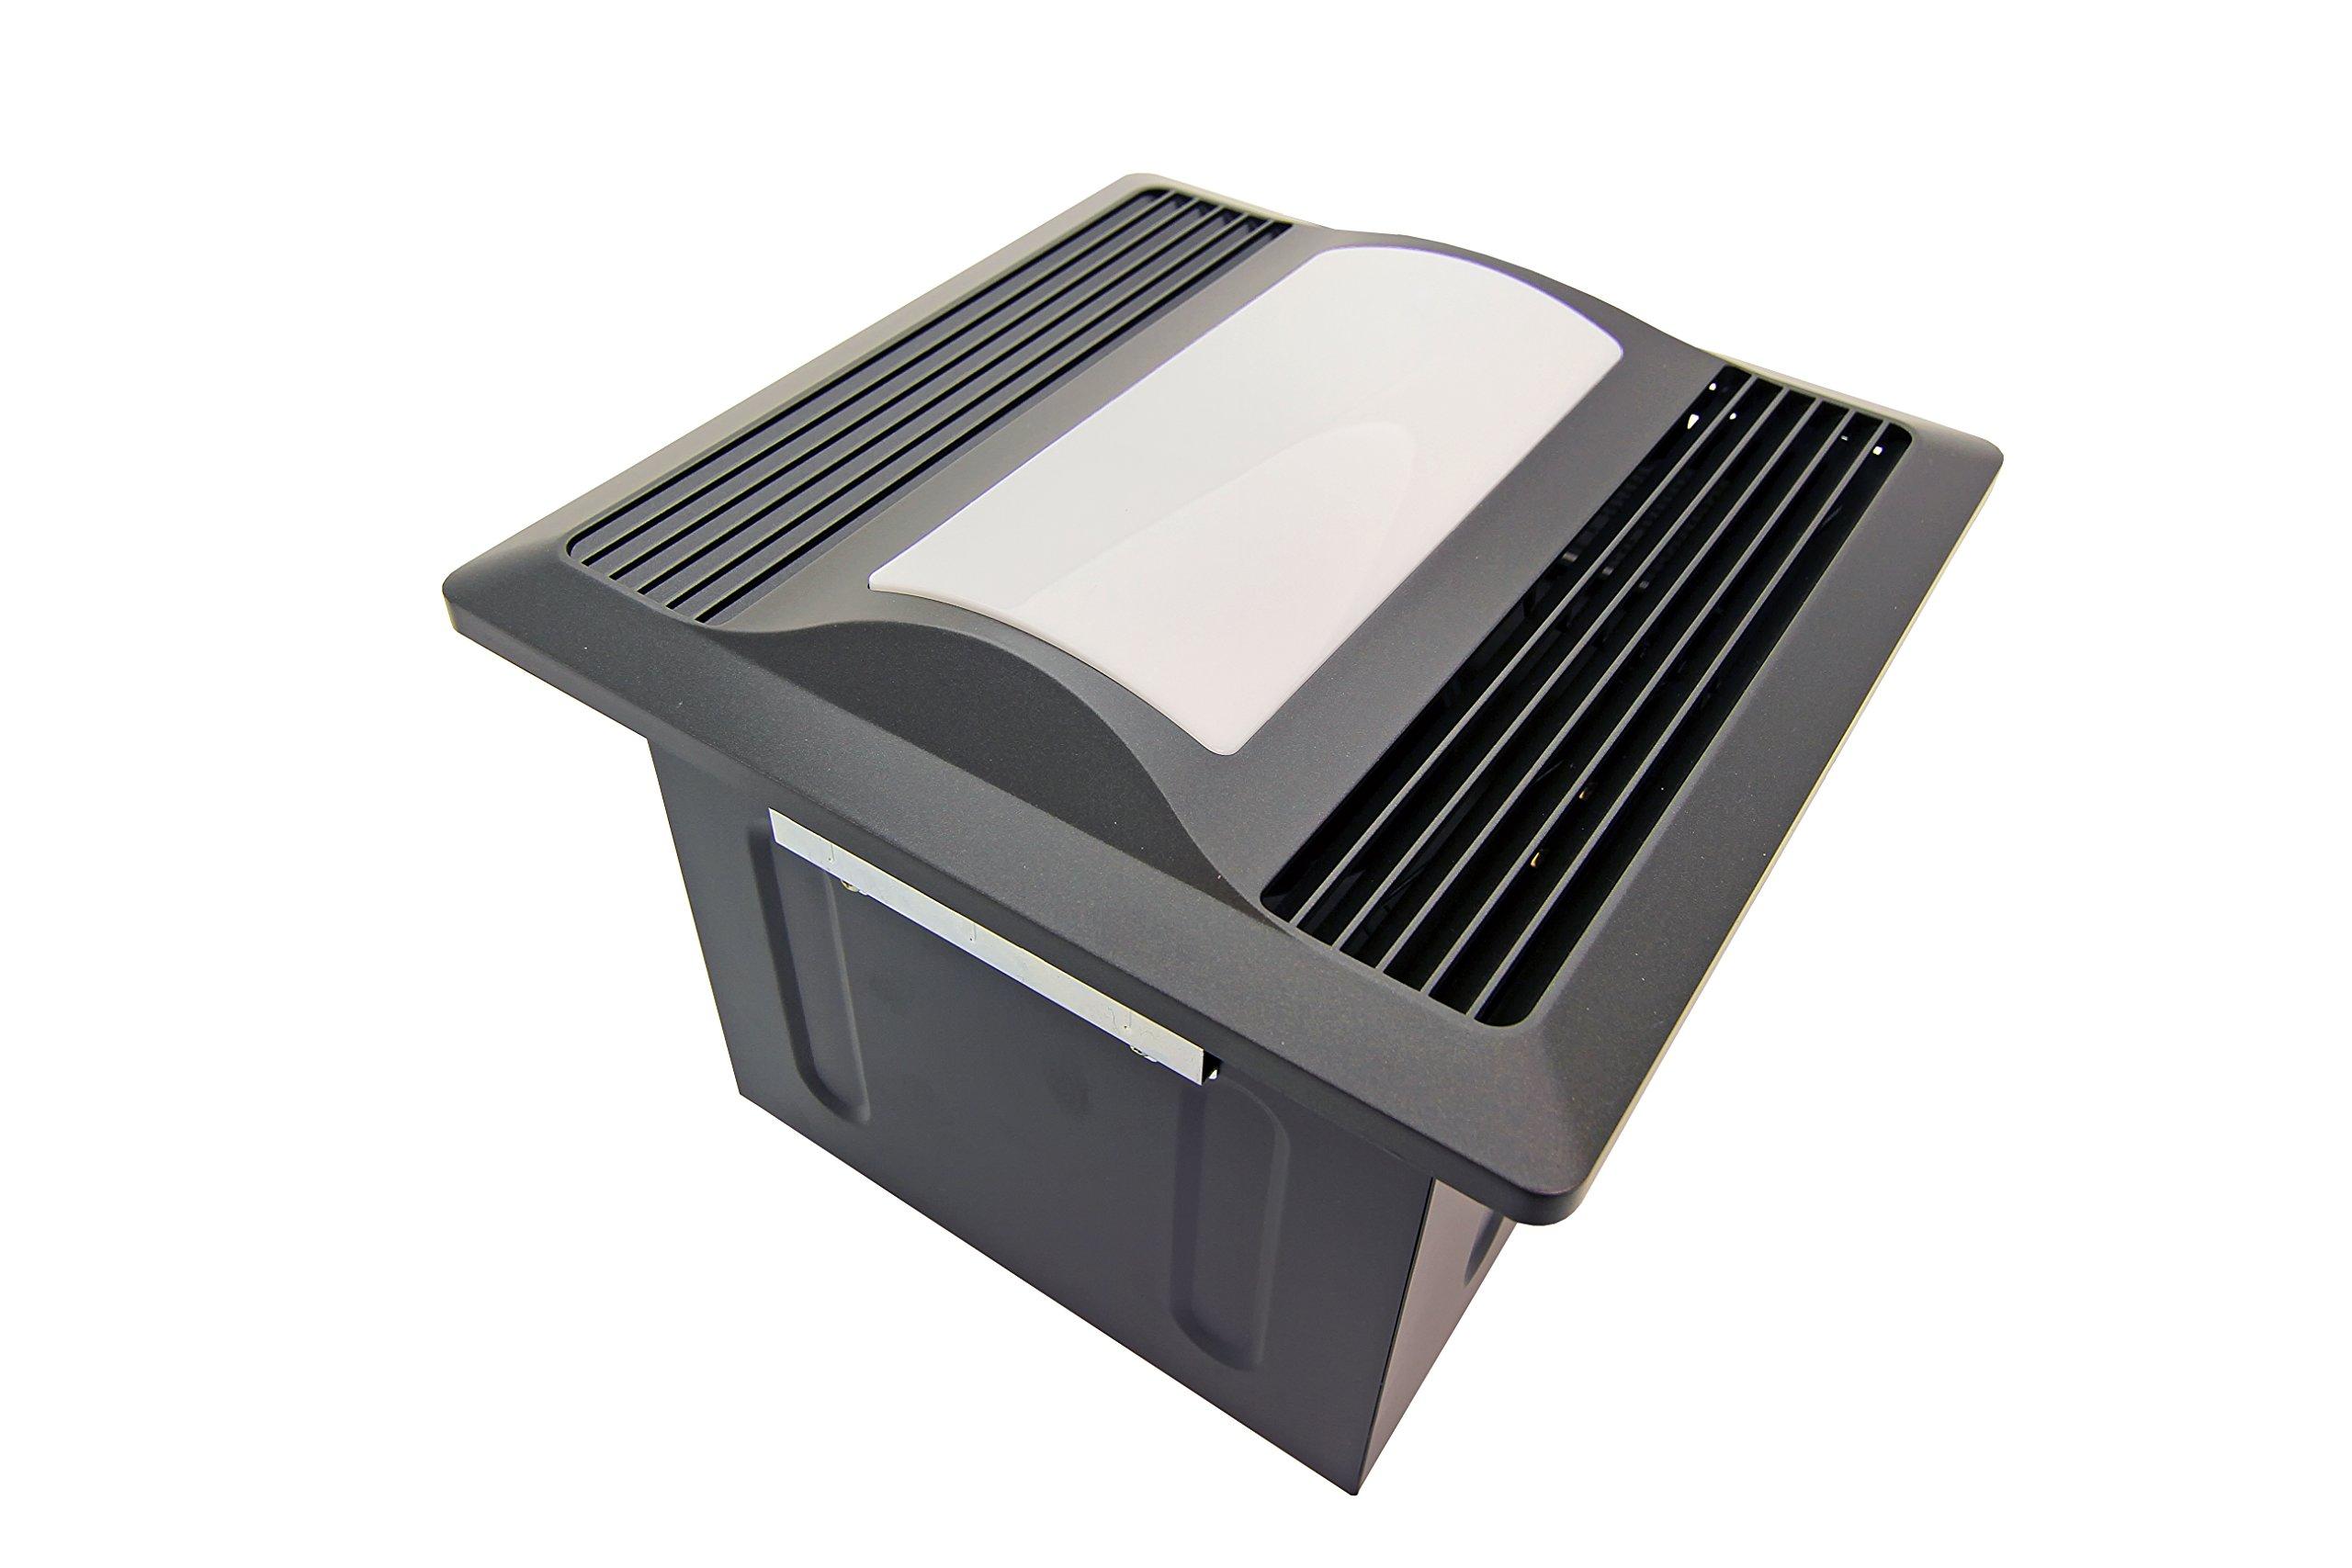 Aero Pure SBF 110 L1 OR 110-CFM Super Quiet Bathroom Ventilation Fan with Light/nightlight Energy Star Qualified, Oil Rubbed Bronze